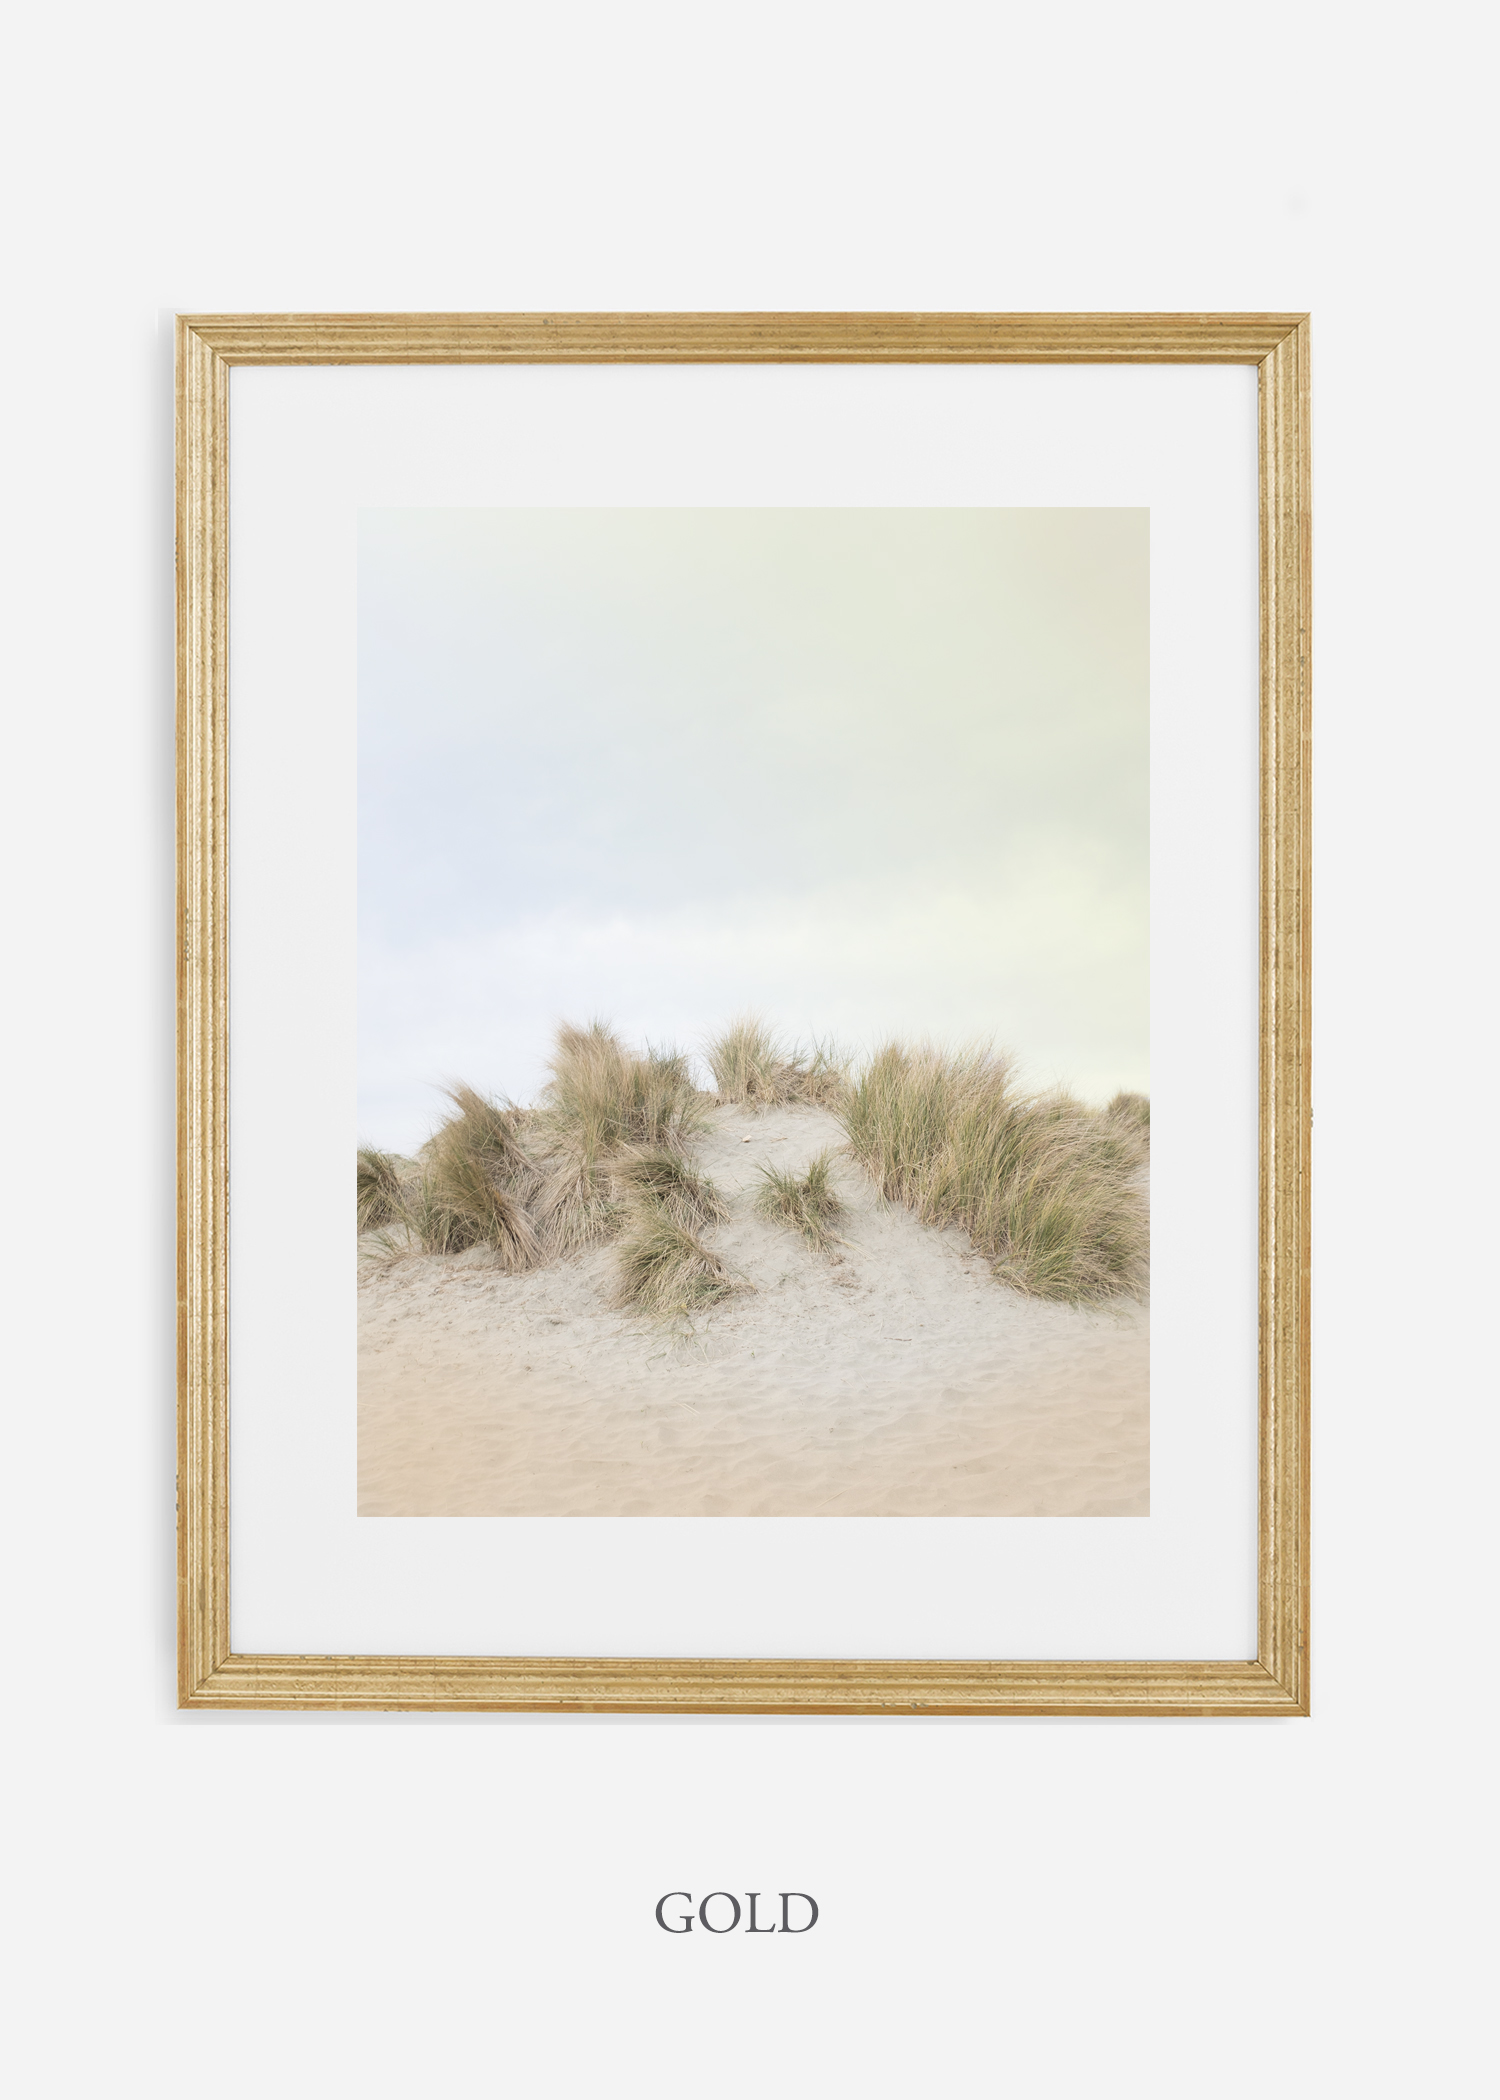 DunesNo.2_goldframe_BigSur_Ocean_Beach__Art_Photography_interiordesign_bohemian_cactusart.jpg